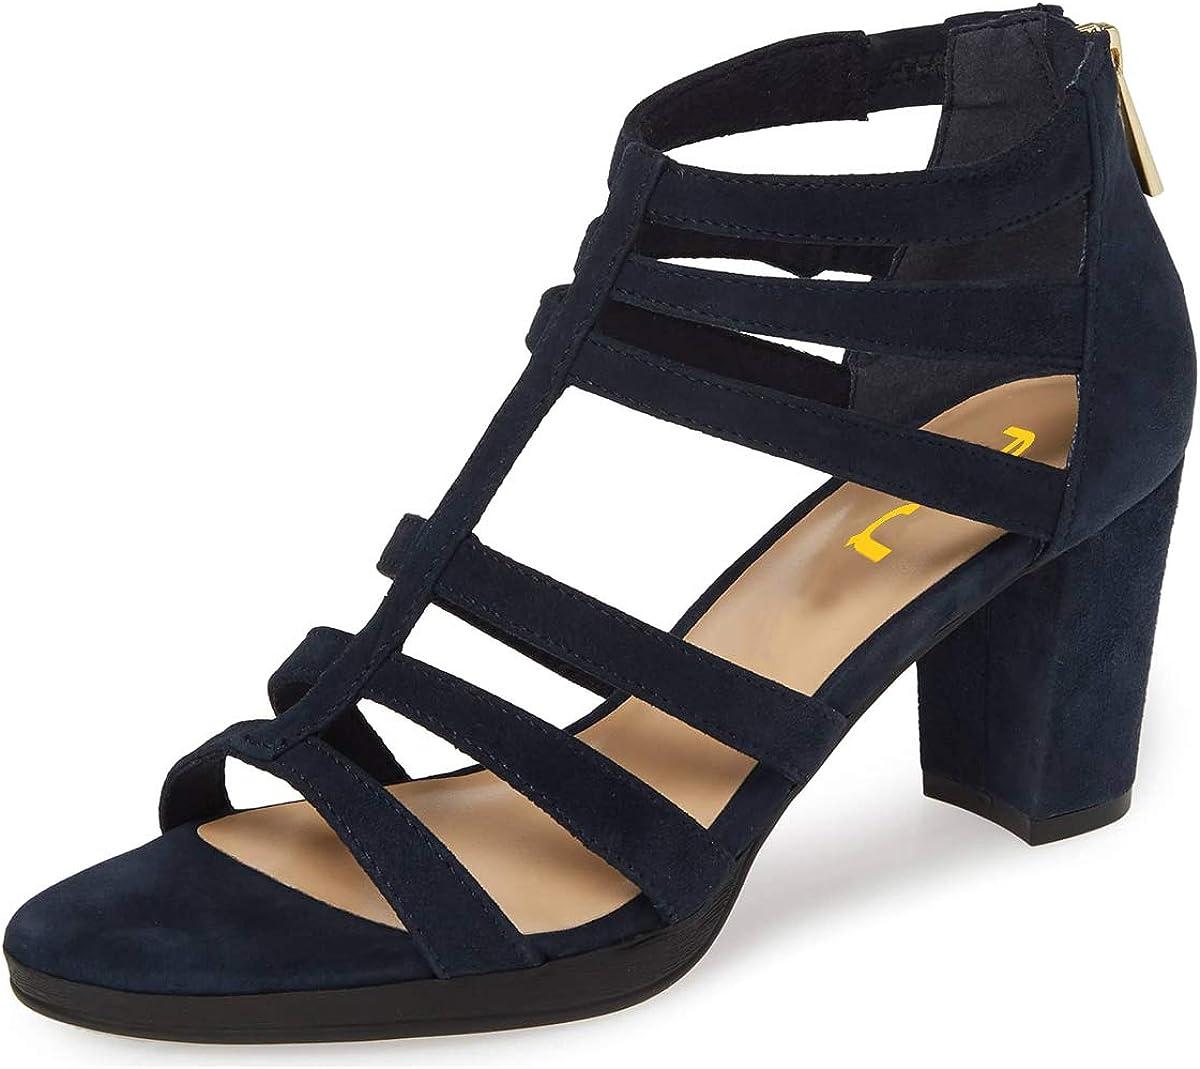 FSJ Women Chunky Mid High Heel Sandals Open Toe T-Strap Pumps Cutout Dress Party Office Shoes Elastic Back Zipper Size 4-15 US